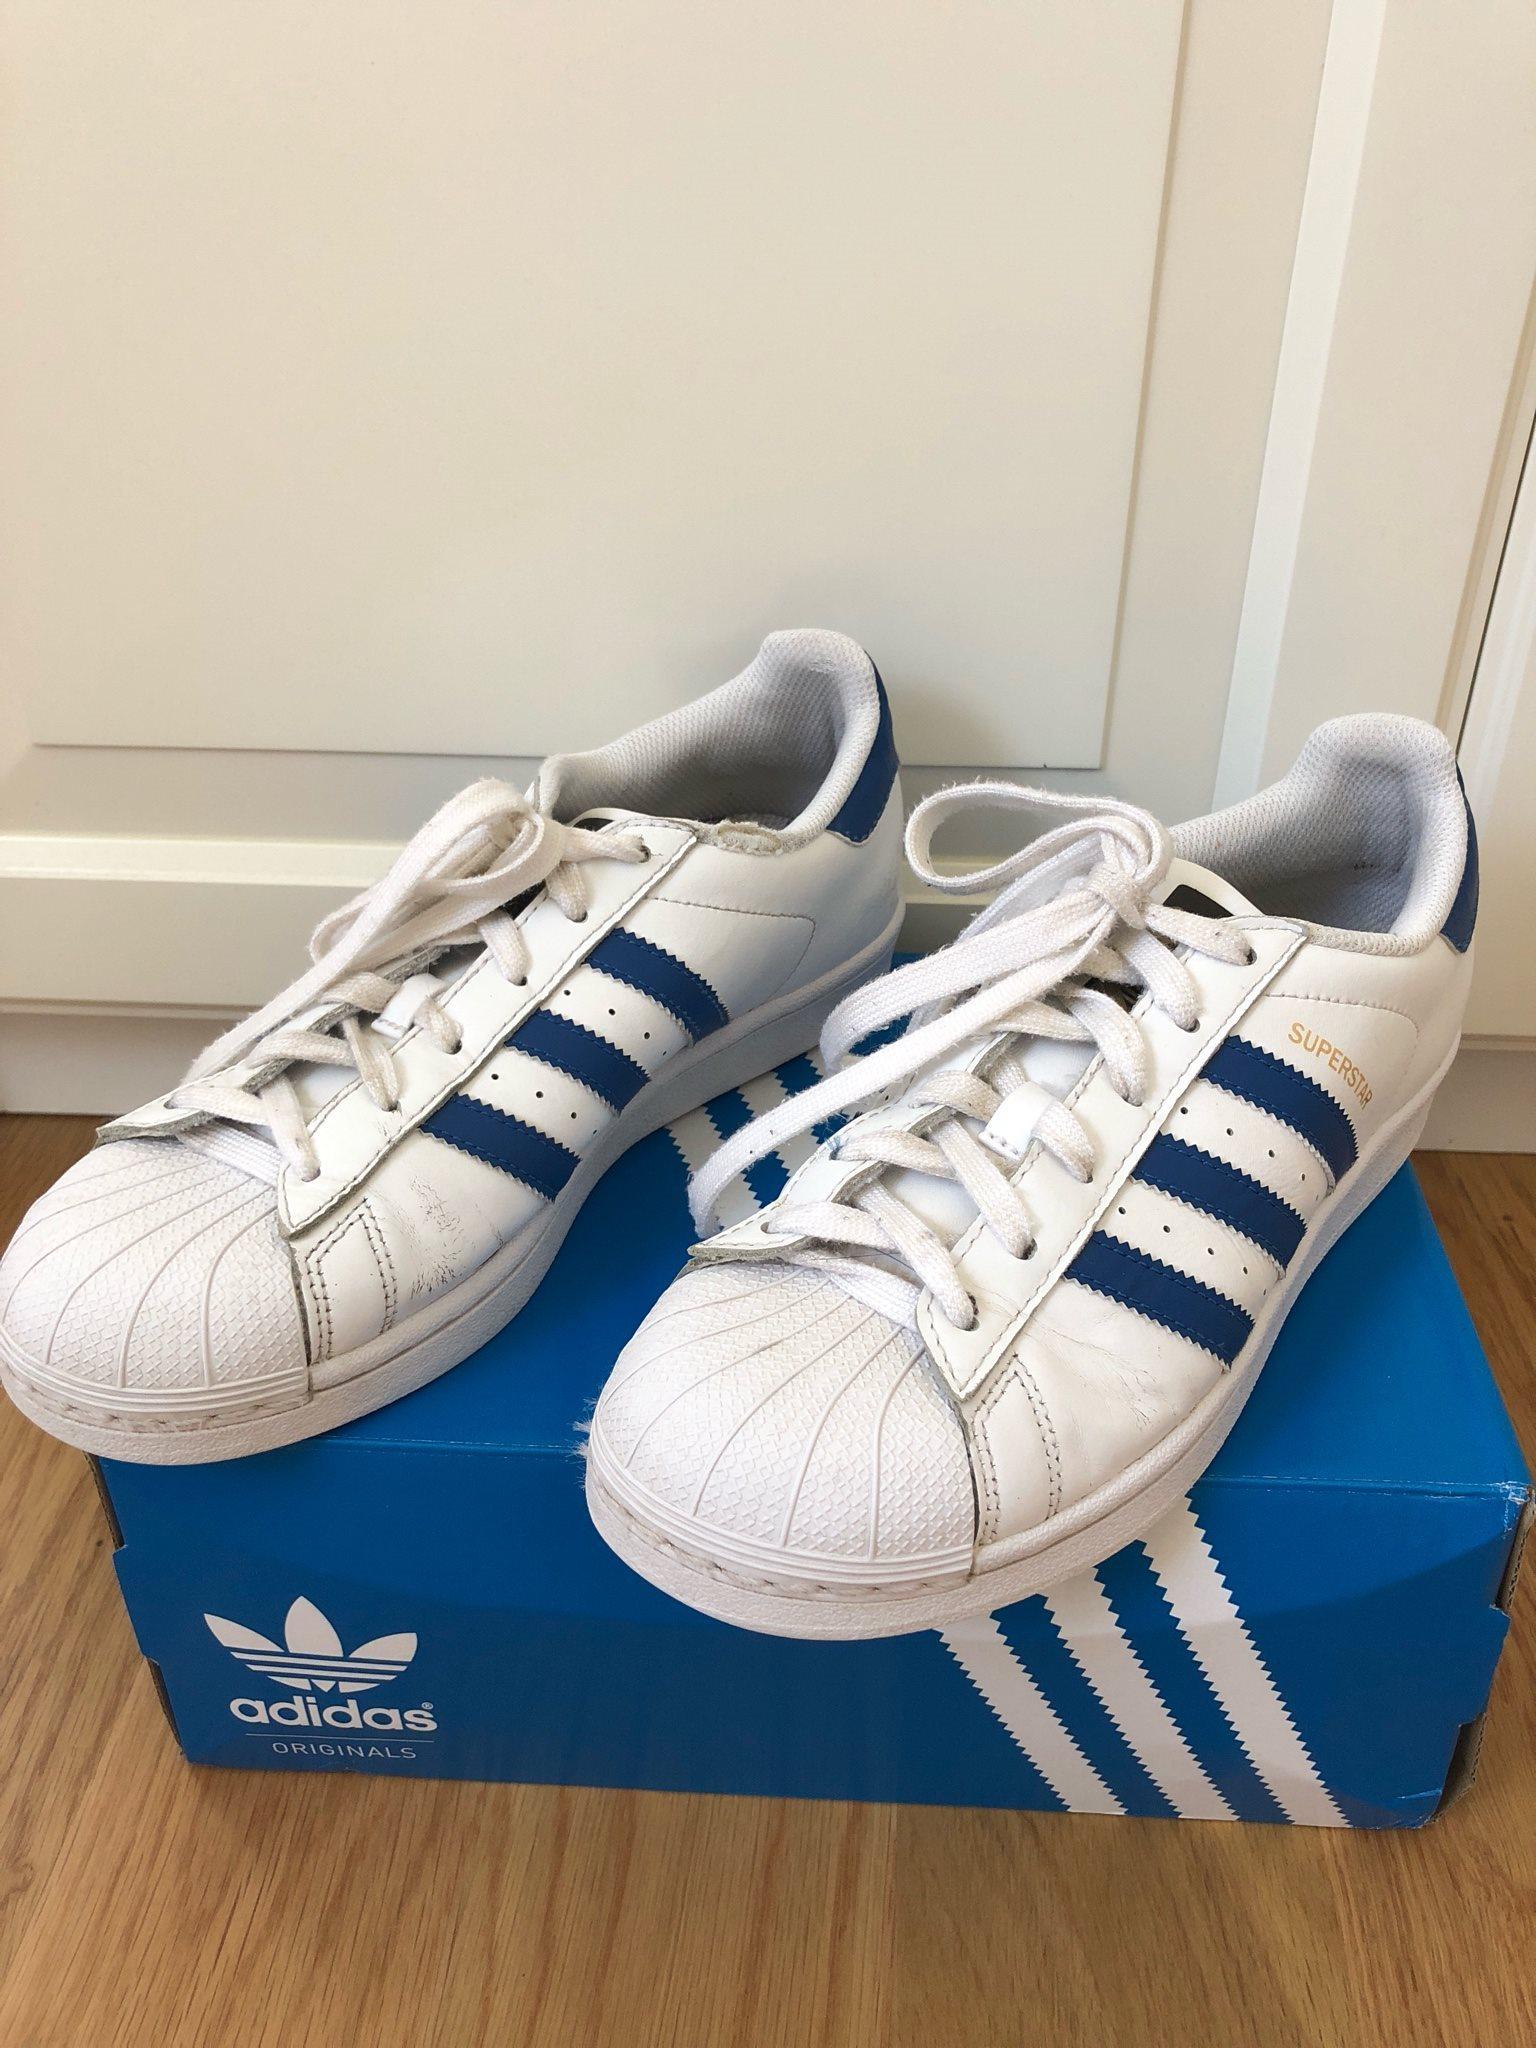 Adidas Superstar Original 38 Sneakers Skor 320130406 Kp P Tradera